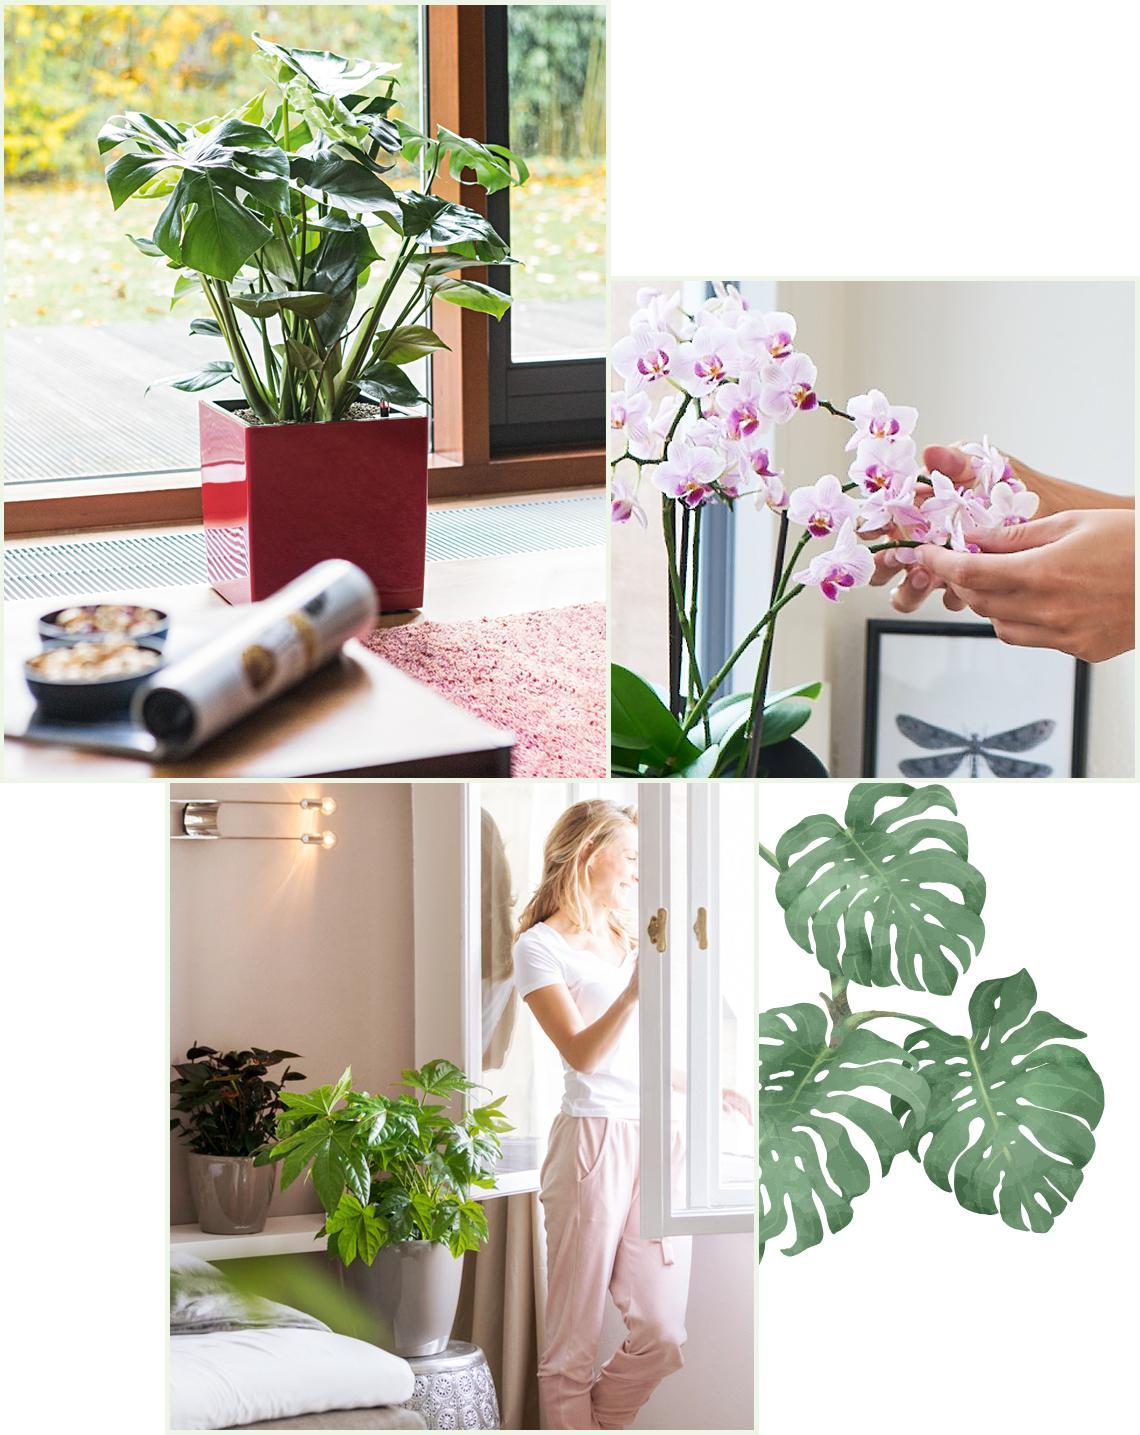 le_tw-indoorplants_abstauben_1